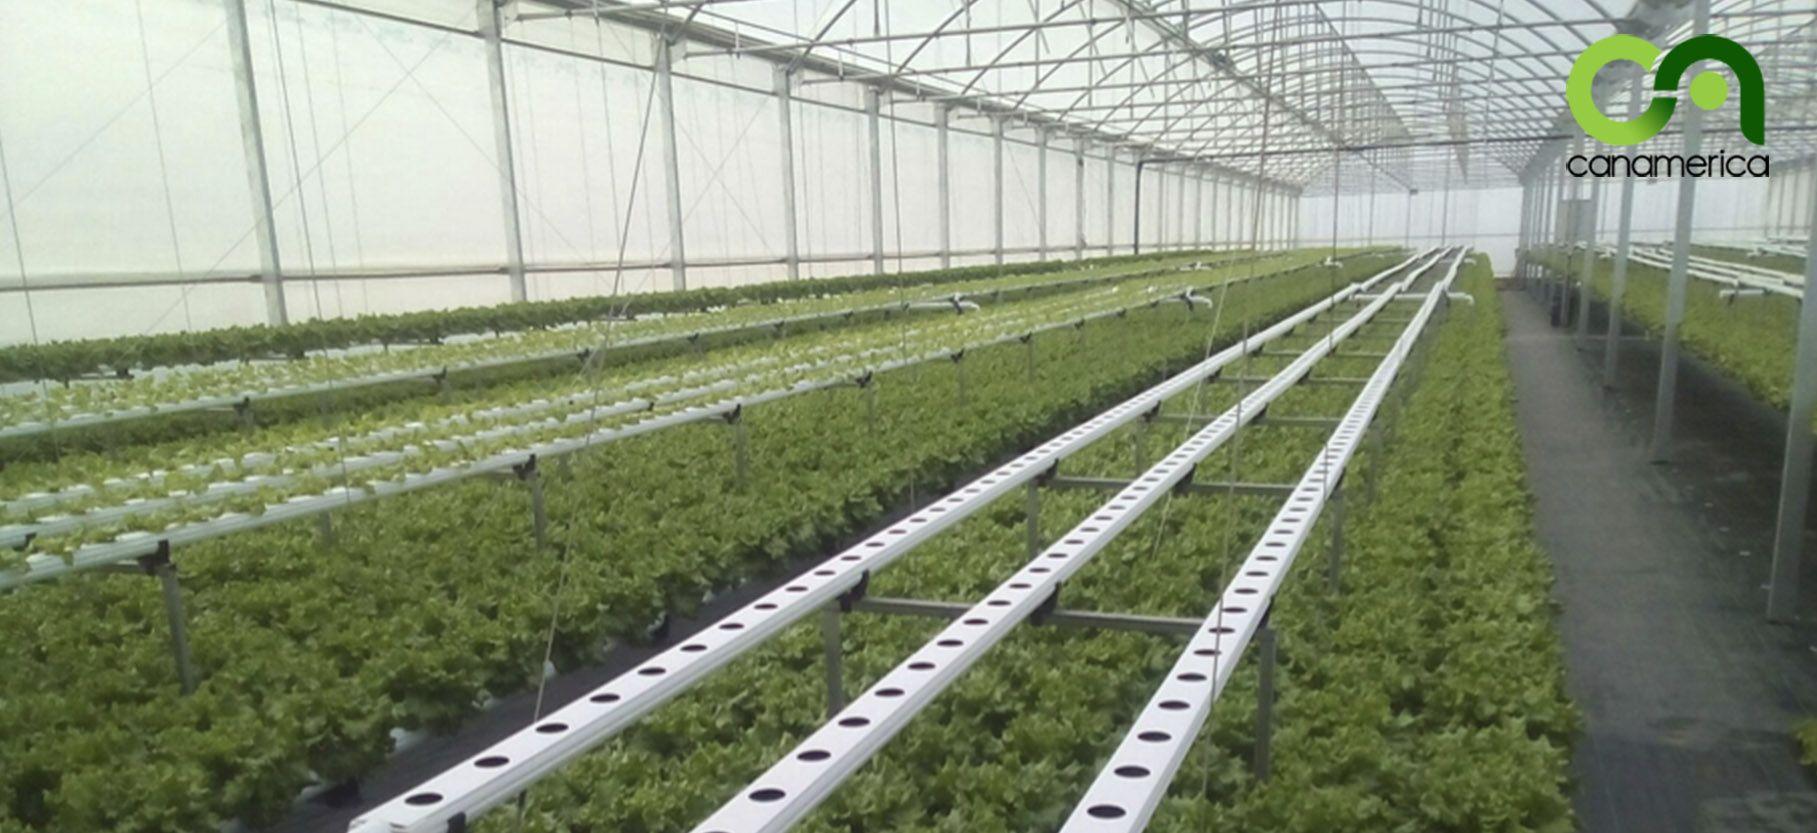 sistema-de-cultivo-nft-canamerica-2